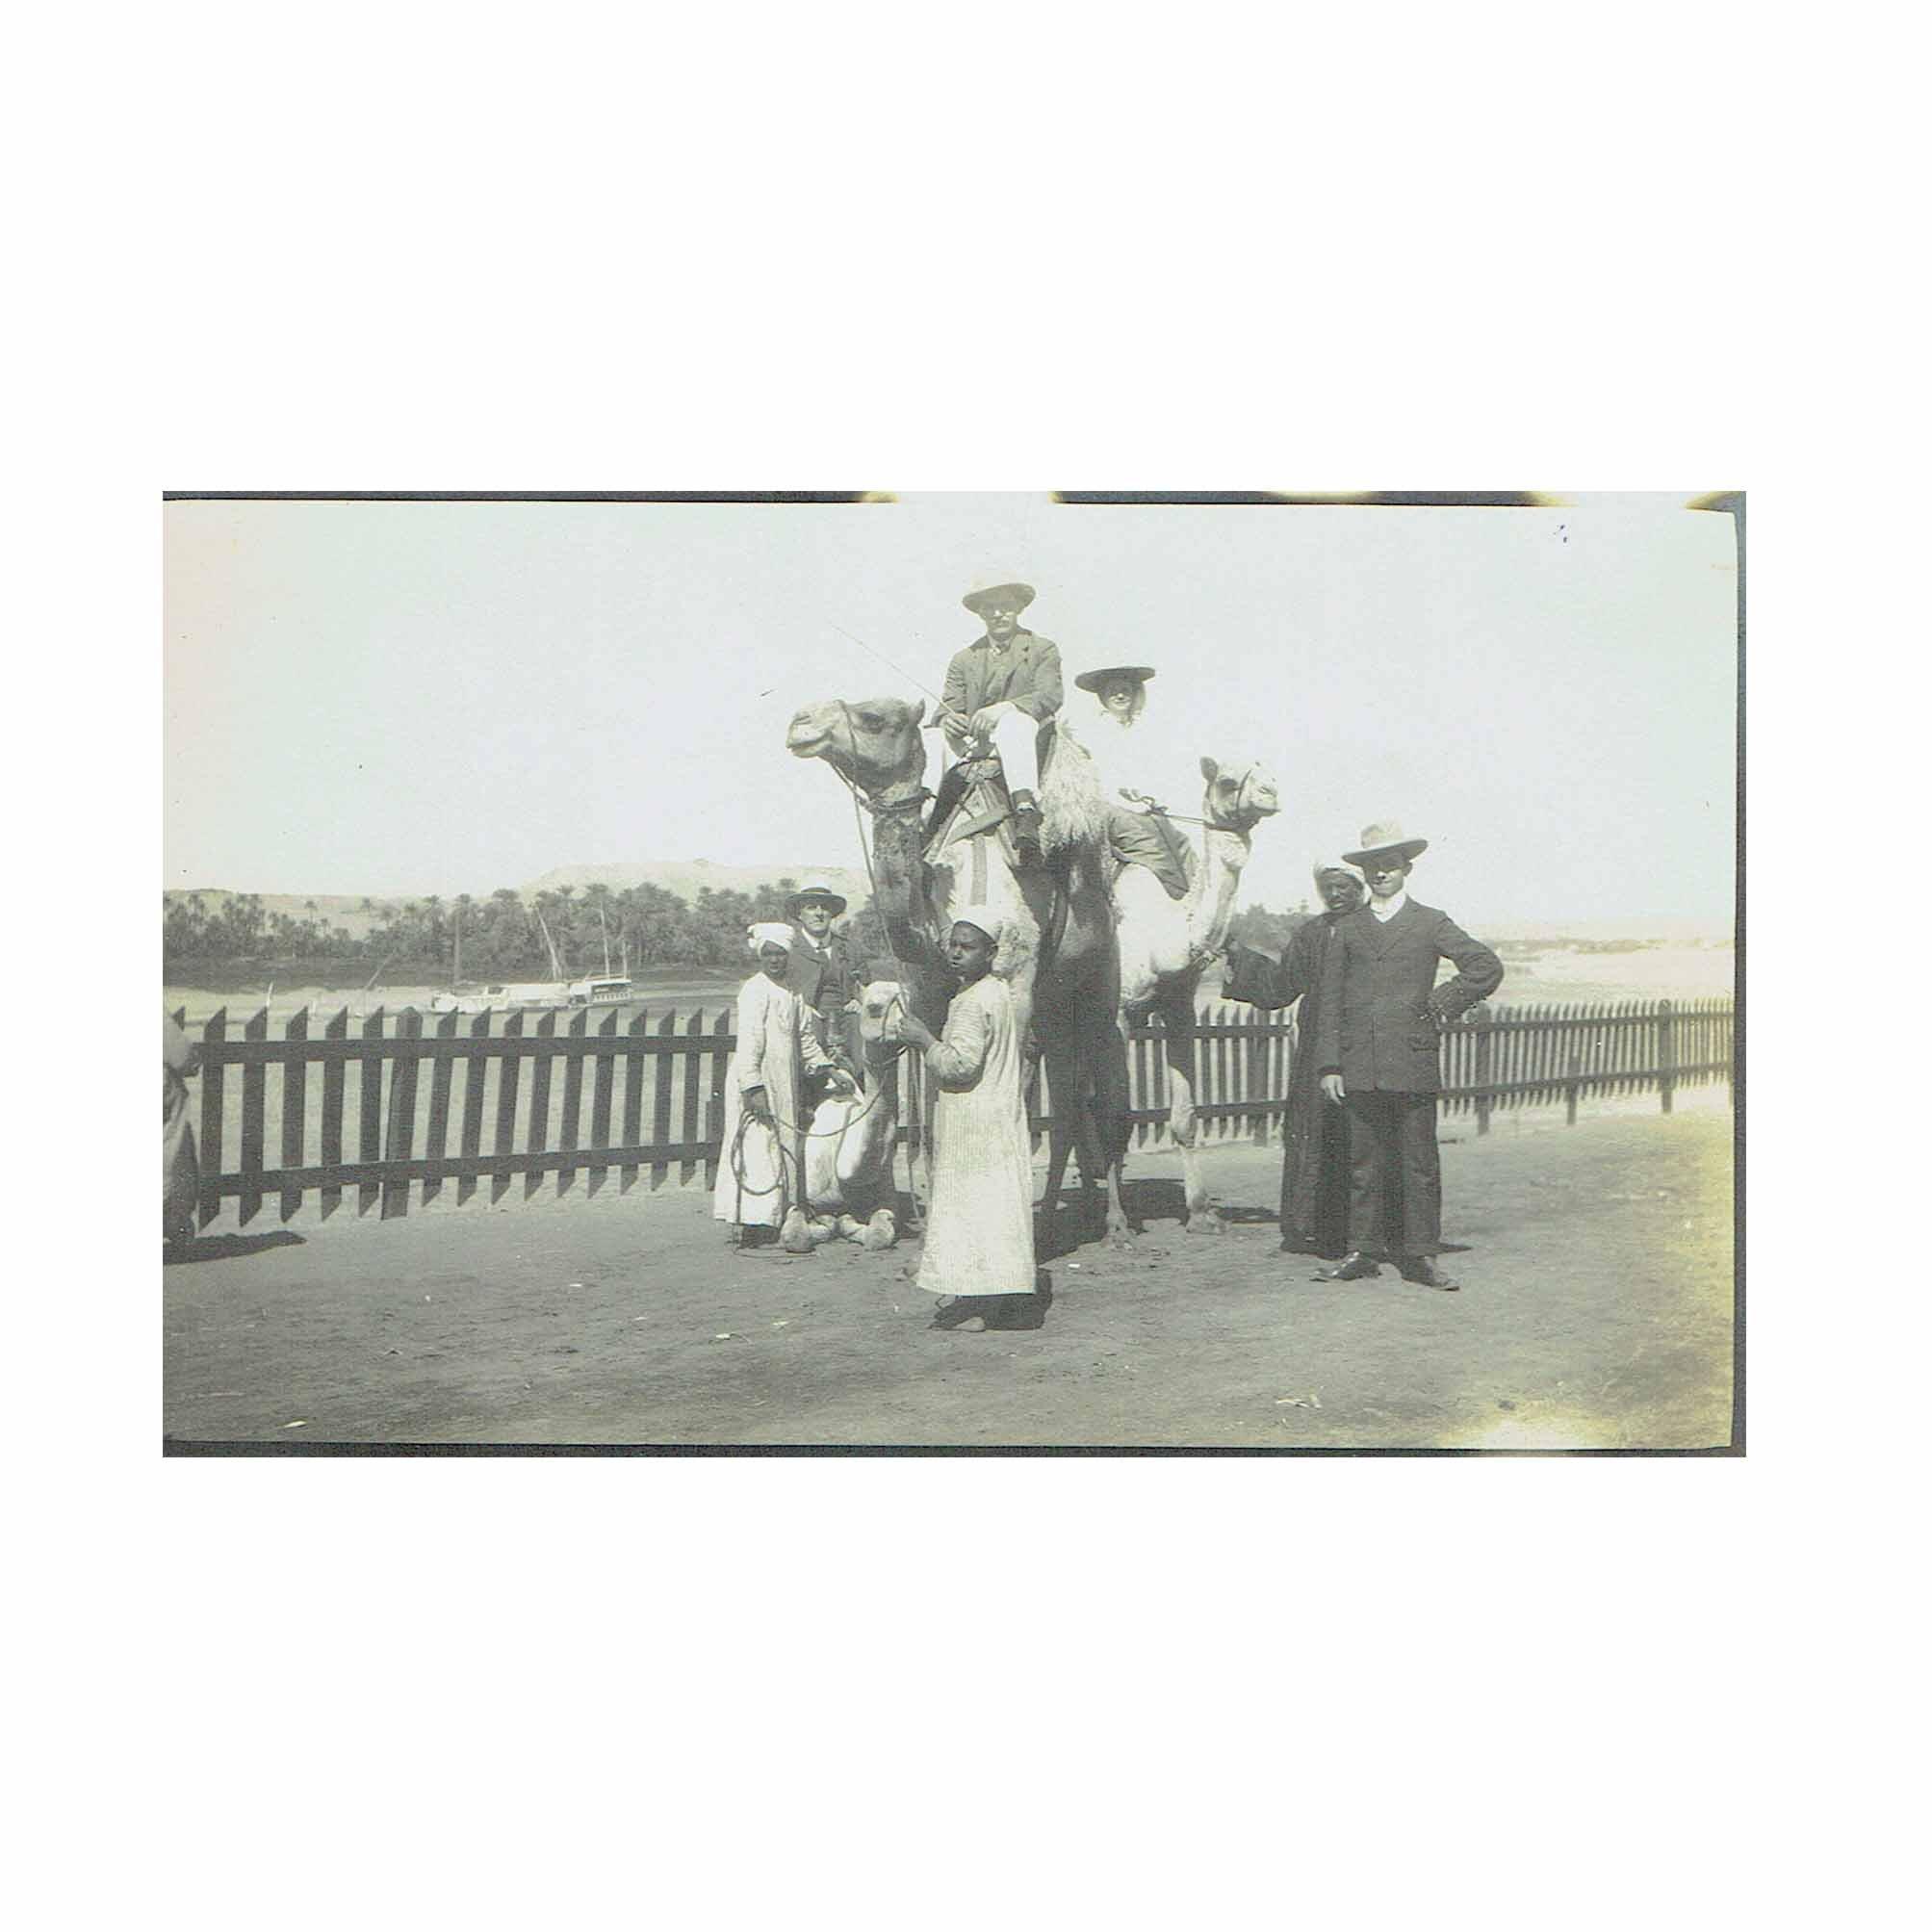 5567 Album Foto Auersperg Aegypten 1908 1909 5 A N